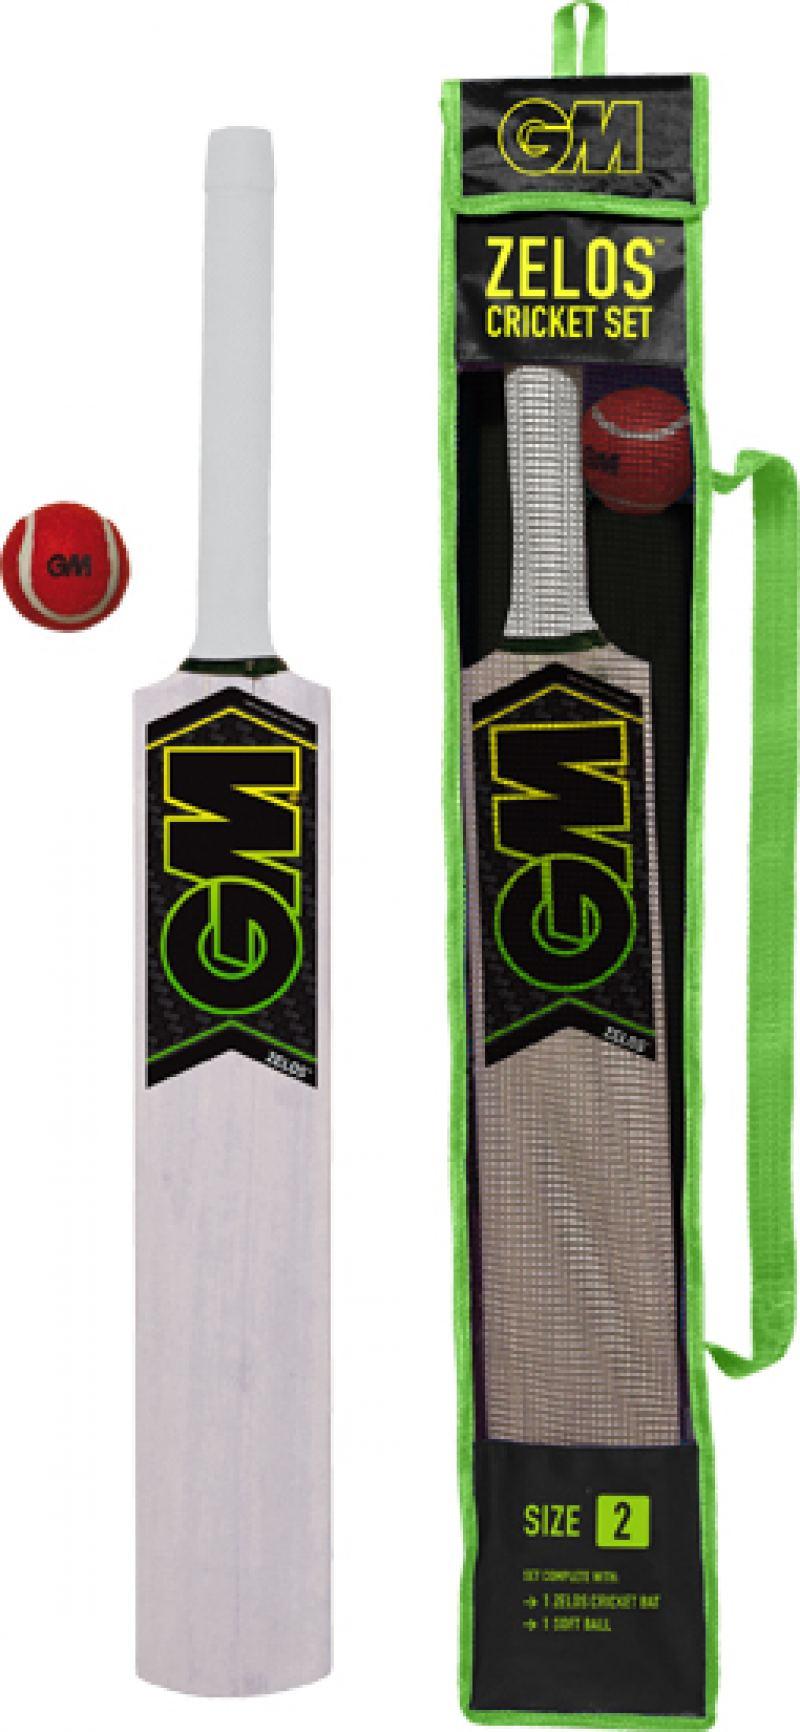 Gunn and Moore Zelos Cricket Set